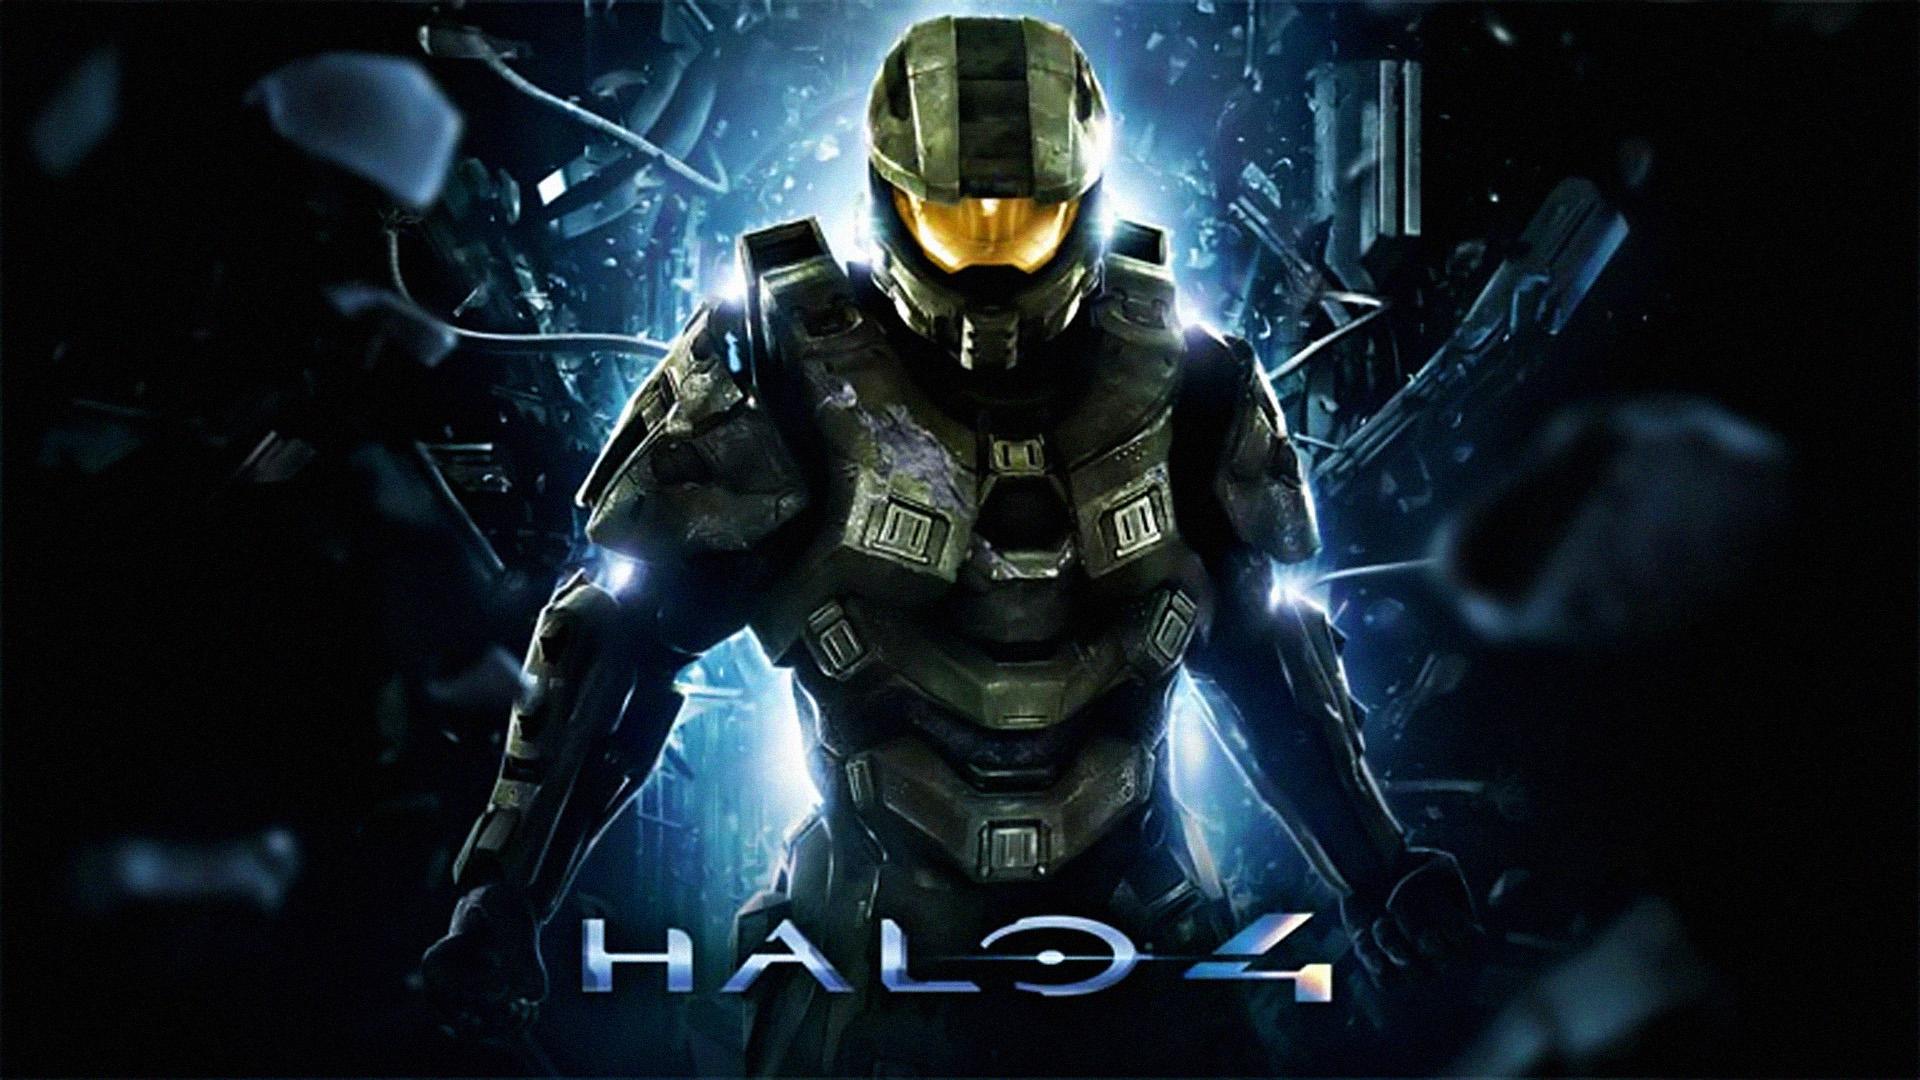 Halo 4 Wallpaper